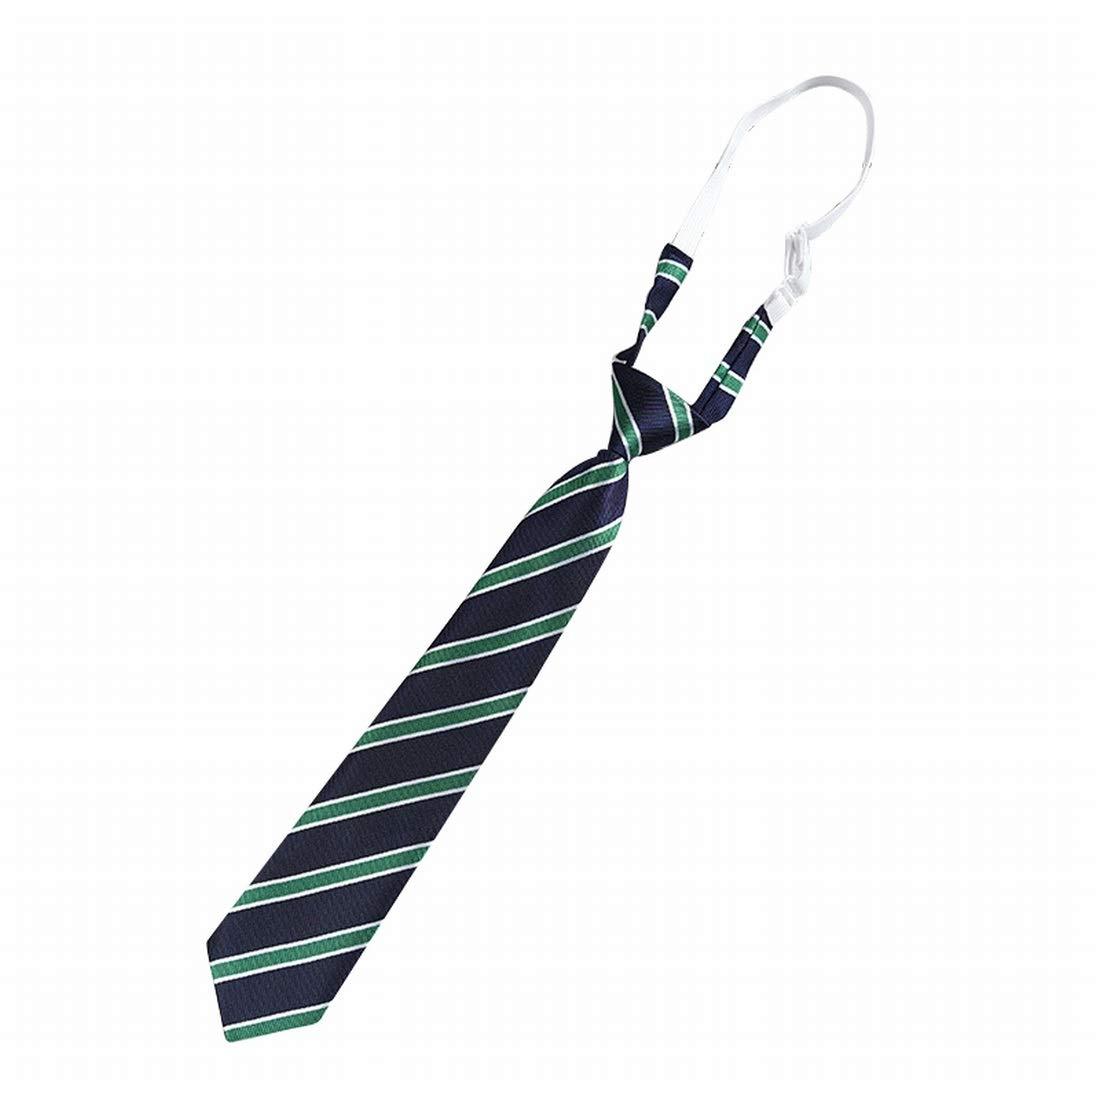 Hemotrade Corbata Corta a Cuadros Uniforme Corbata para ...